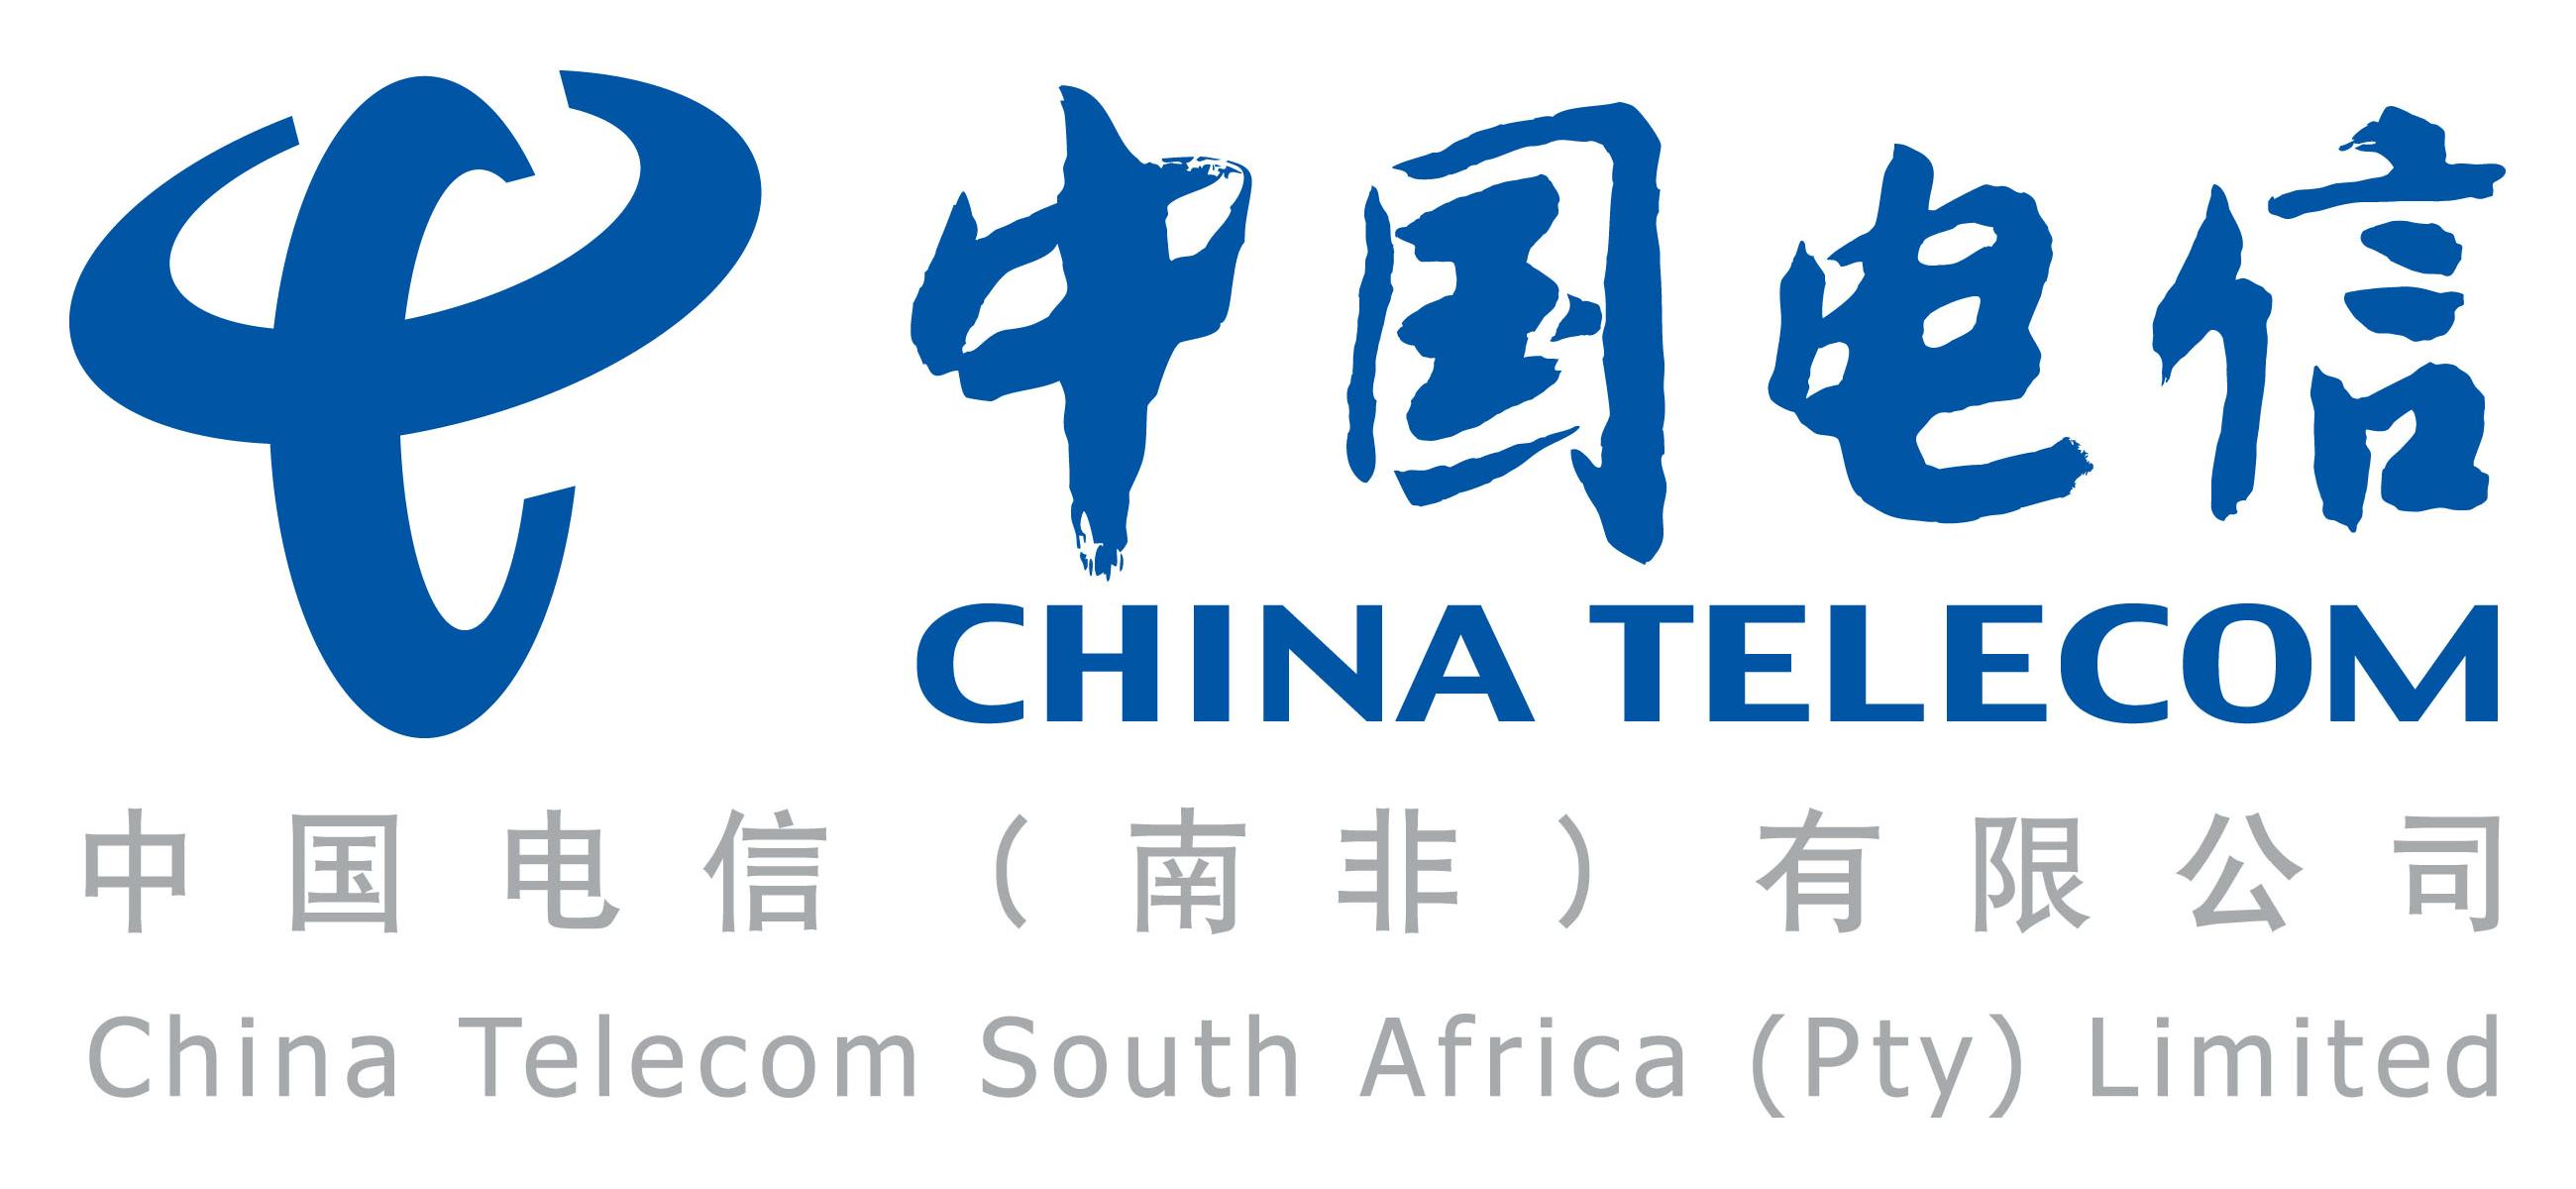 of Telecommunications in Gauteng in City of Johannesburg